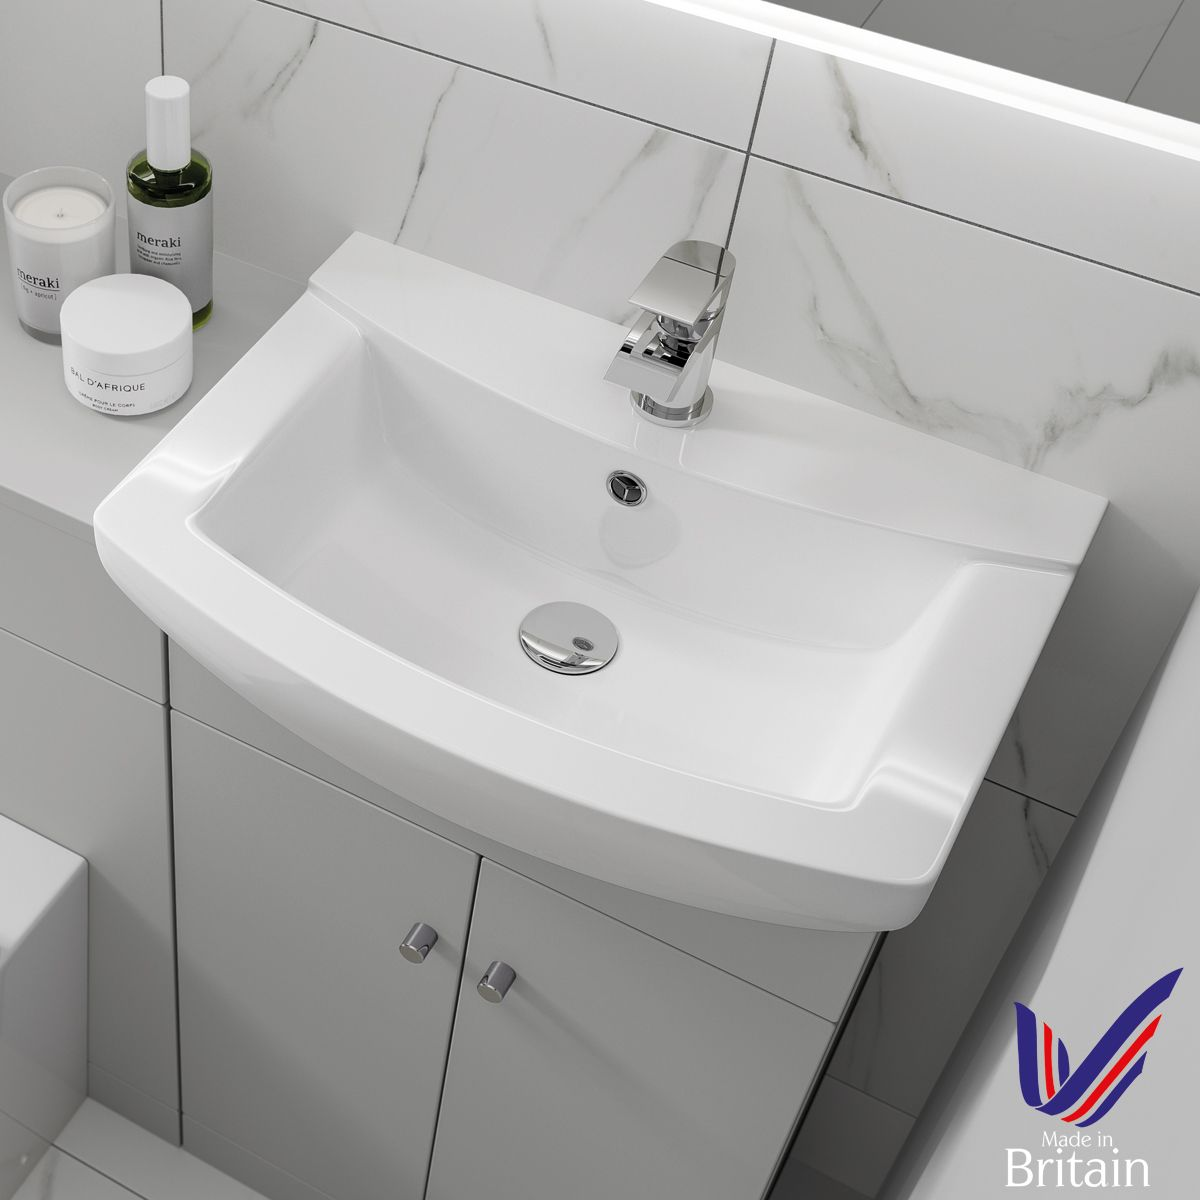 Ikoma White Gloss Vanity Unit with Basin 650mm Basin